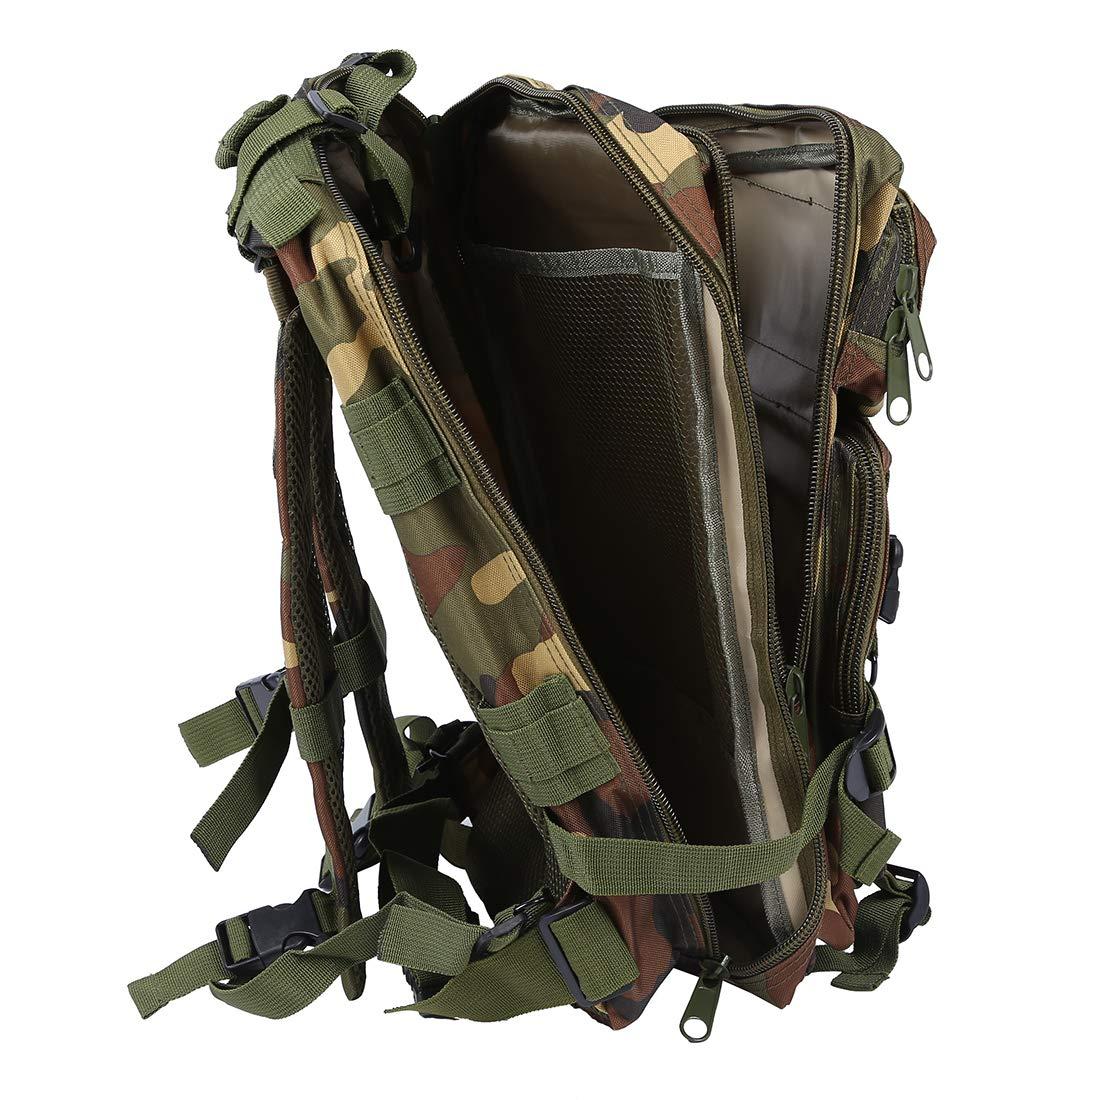 Camuflaje de Selva SODIAL R Mochila Deportivo Exterior Militar 30L para Campamento Excursionismo